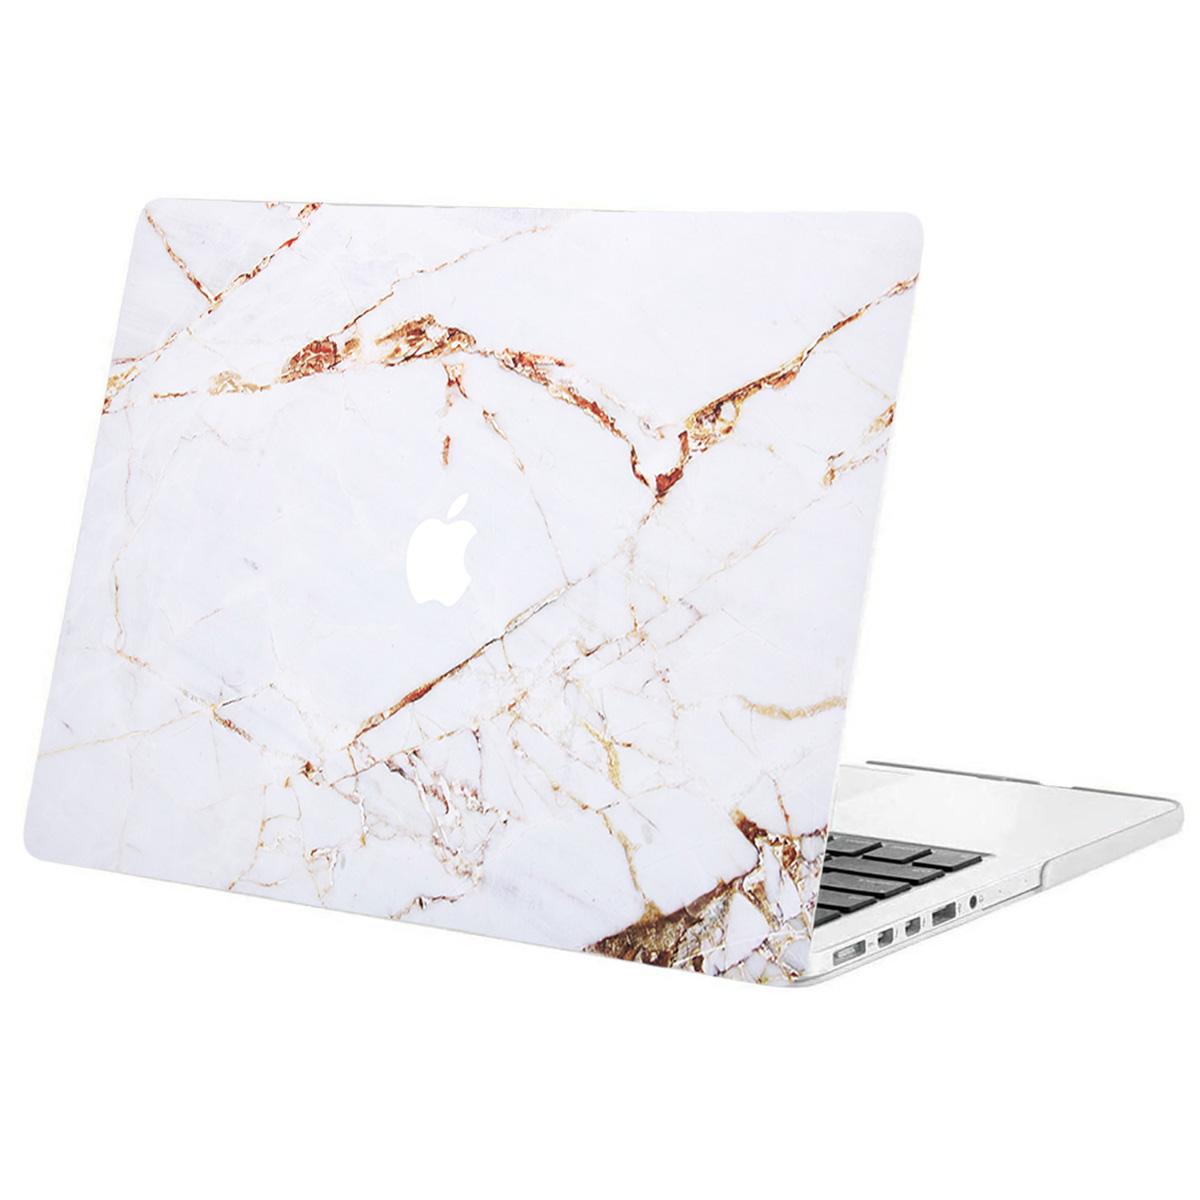 iMoshion Design Laptop Cover MacBook Pro 13 Zoll Retina -White Marble